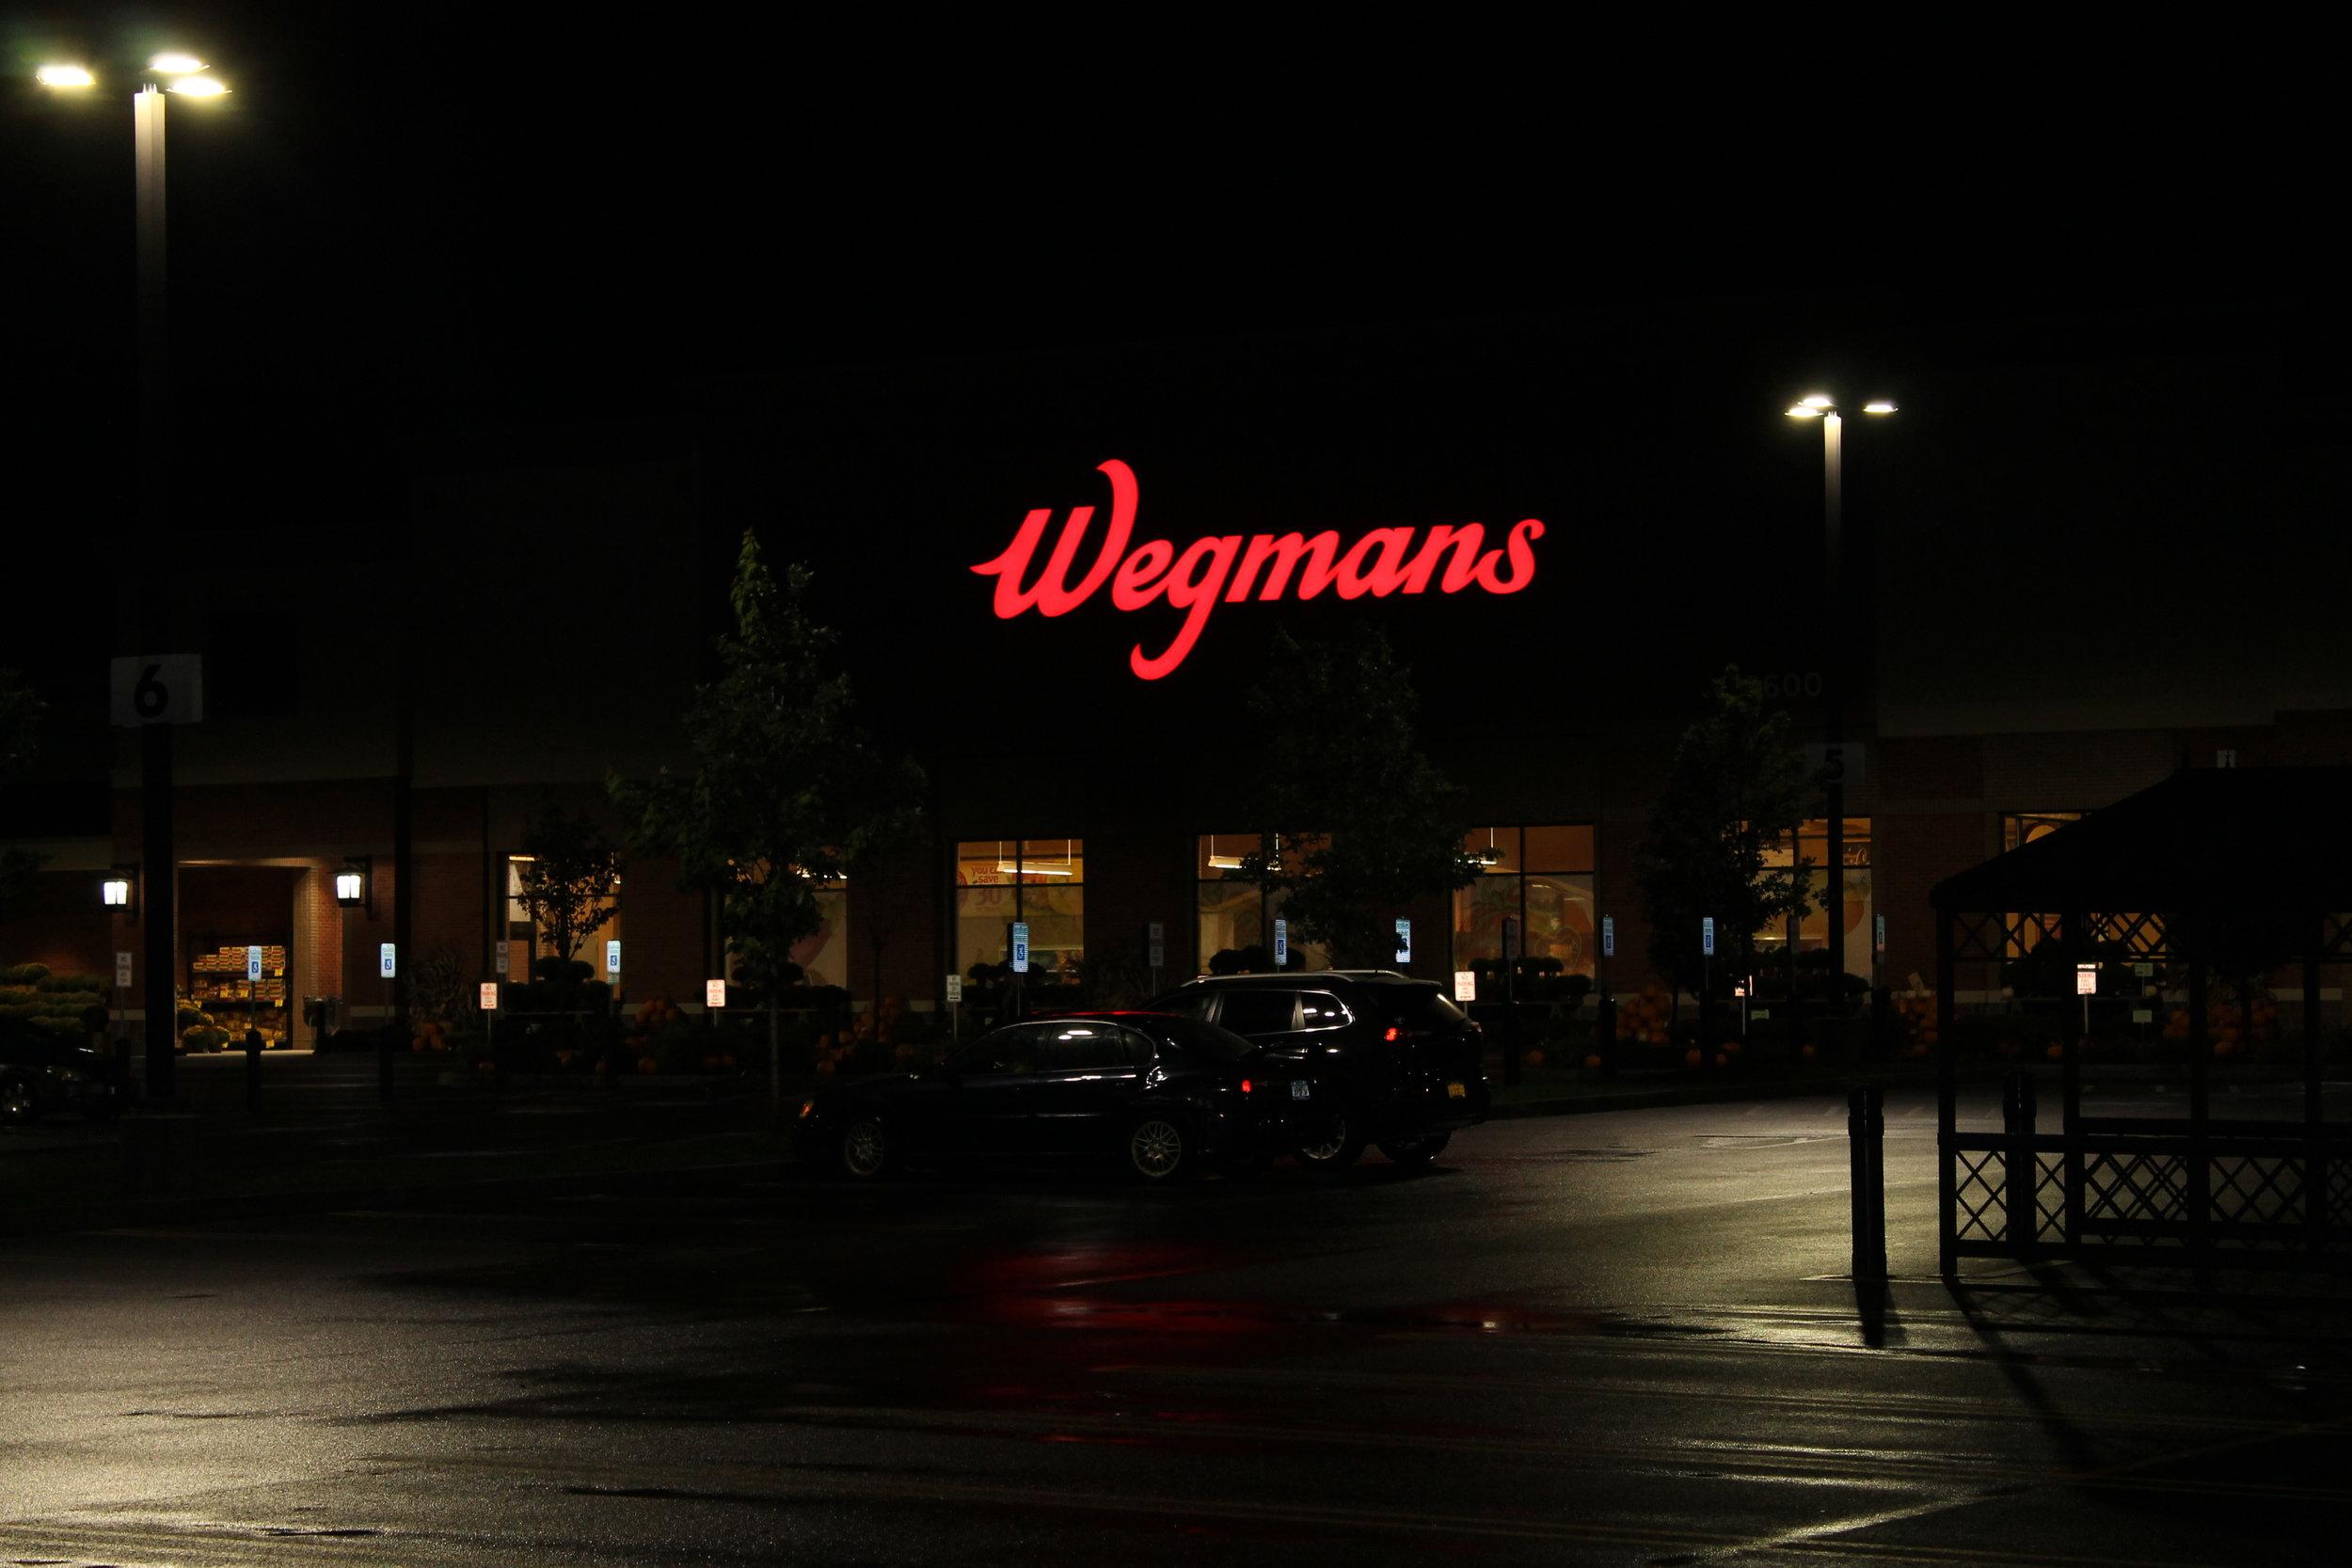 Wegmans night.JPG